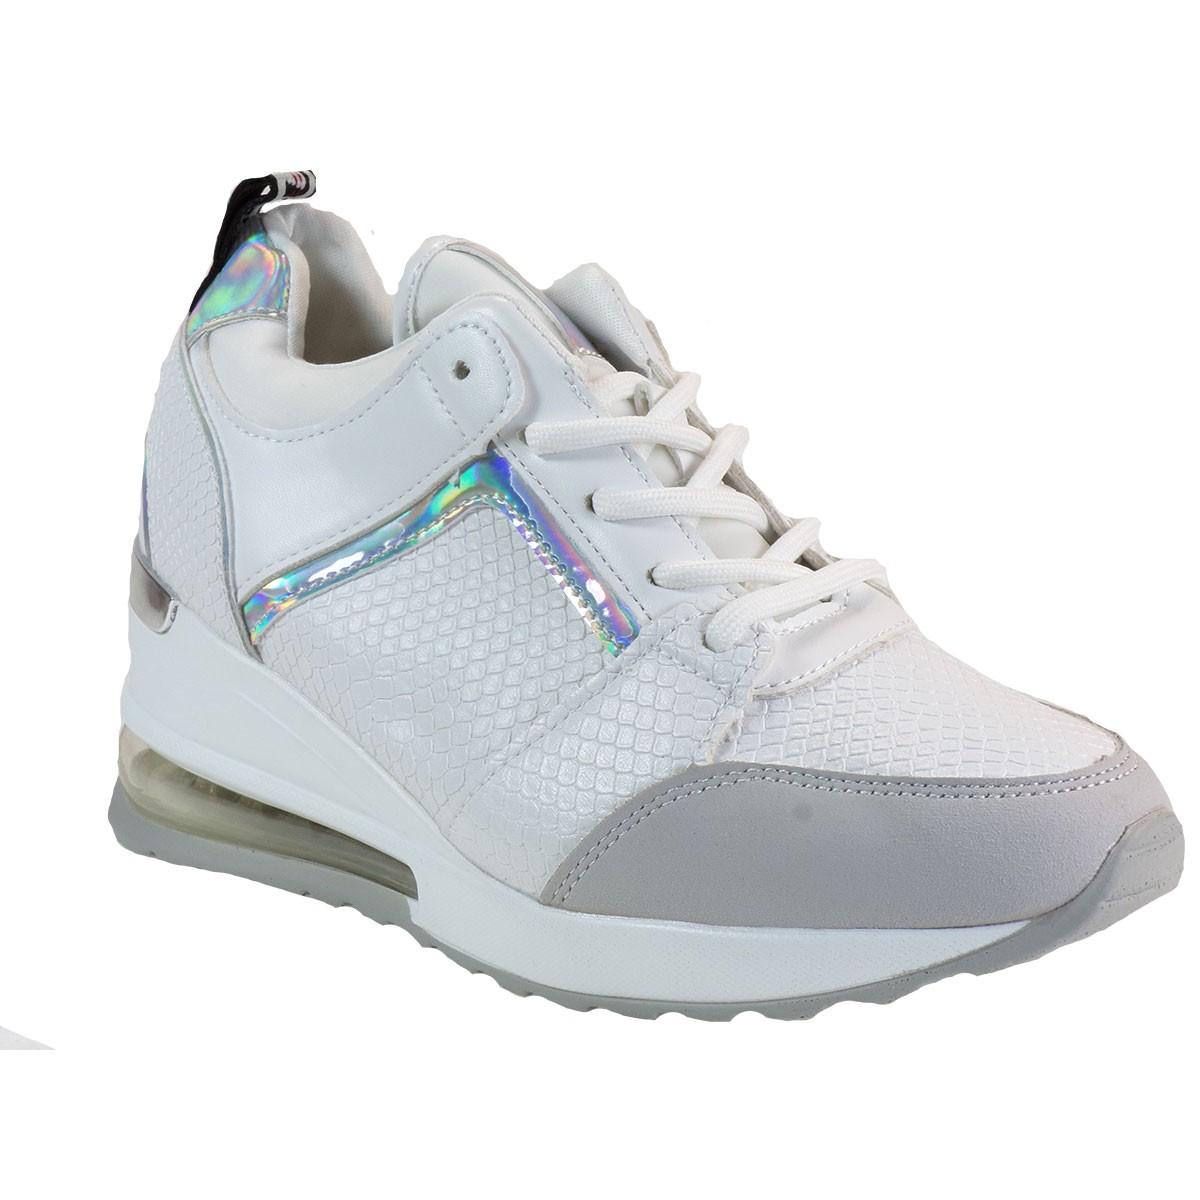 Bagiota Shoes Γυναικεία Παπούτσια Sneakers Αθλητικά Β0-245 Λευκό